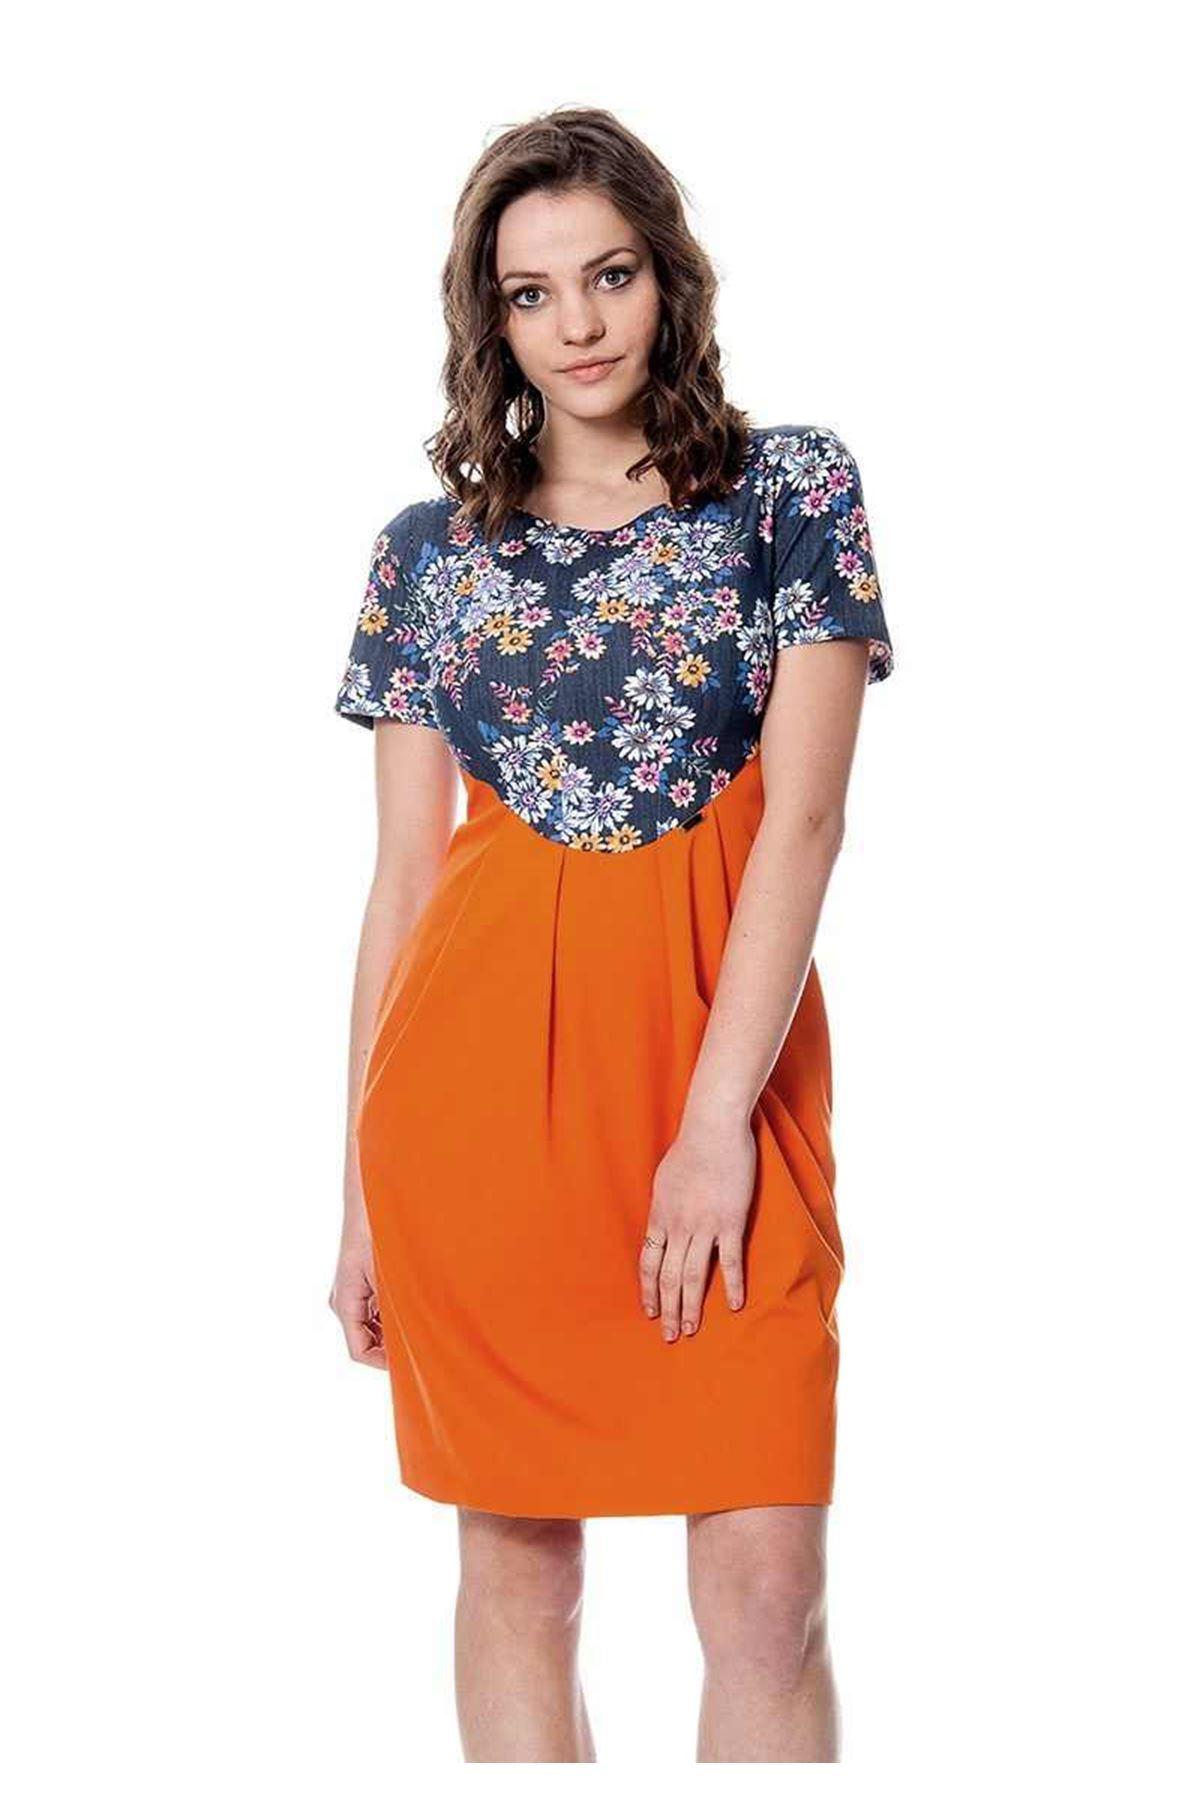 Turuncu Çiçekli Elbise F3-106641